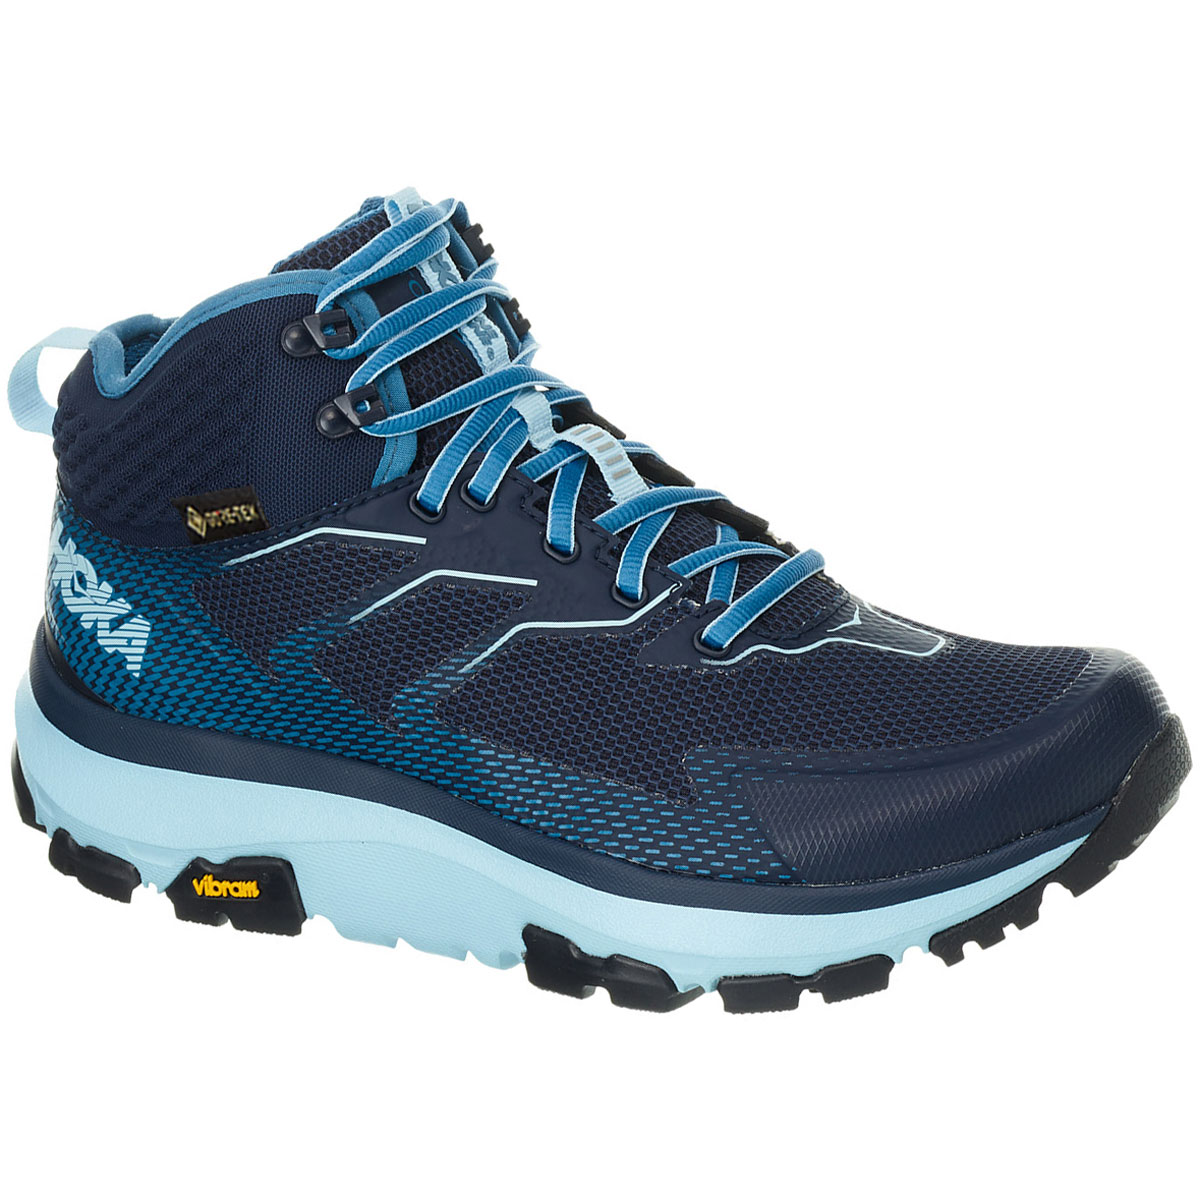 Women's Hoka One One Sky Toa Gore-Tex Trail Running Shoe - Color: Black Iris/Aquamarine - Size: 5 - Width: Regular, Black Iris/Aquamarine, large, image 2